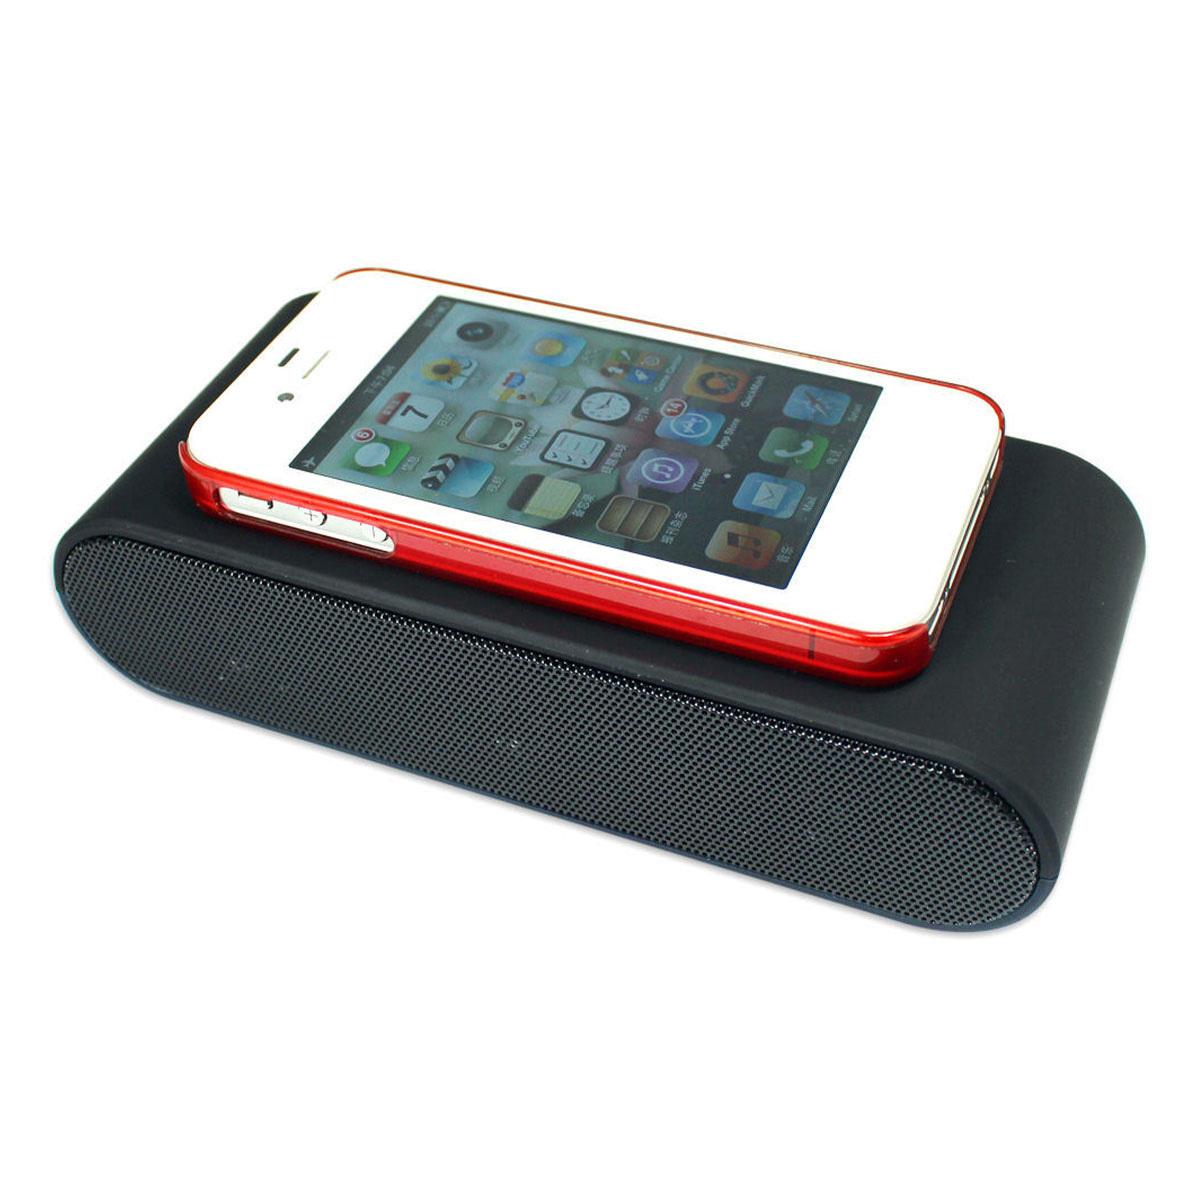 98-1108-01-mobiler-lautsprecher-für-smartphones-touchplay-upbeat-anwendung4-1200x1200px.jpg